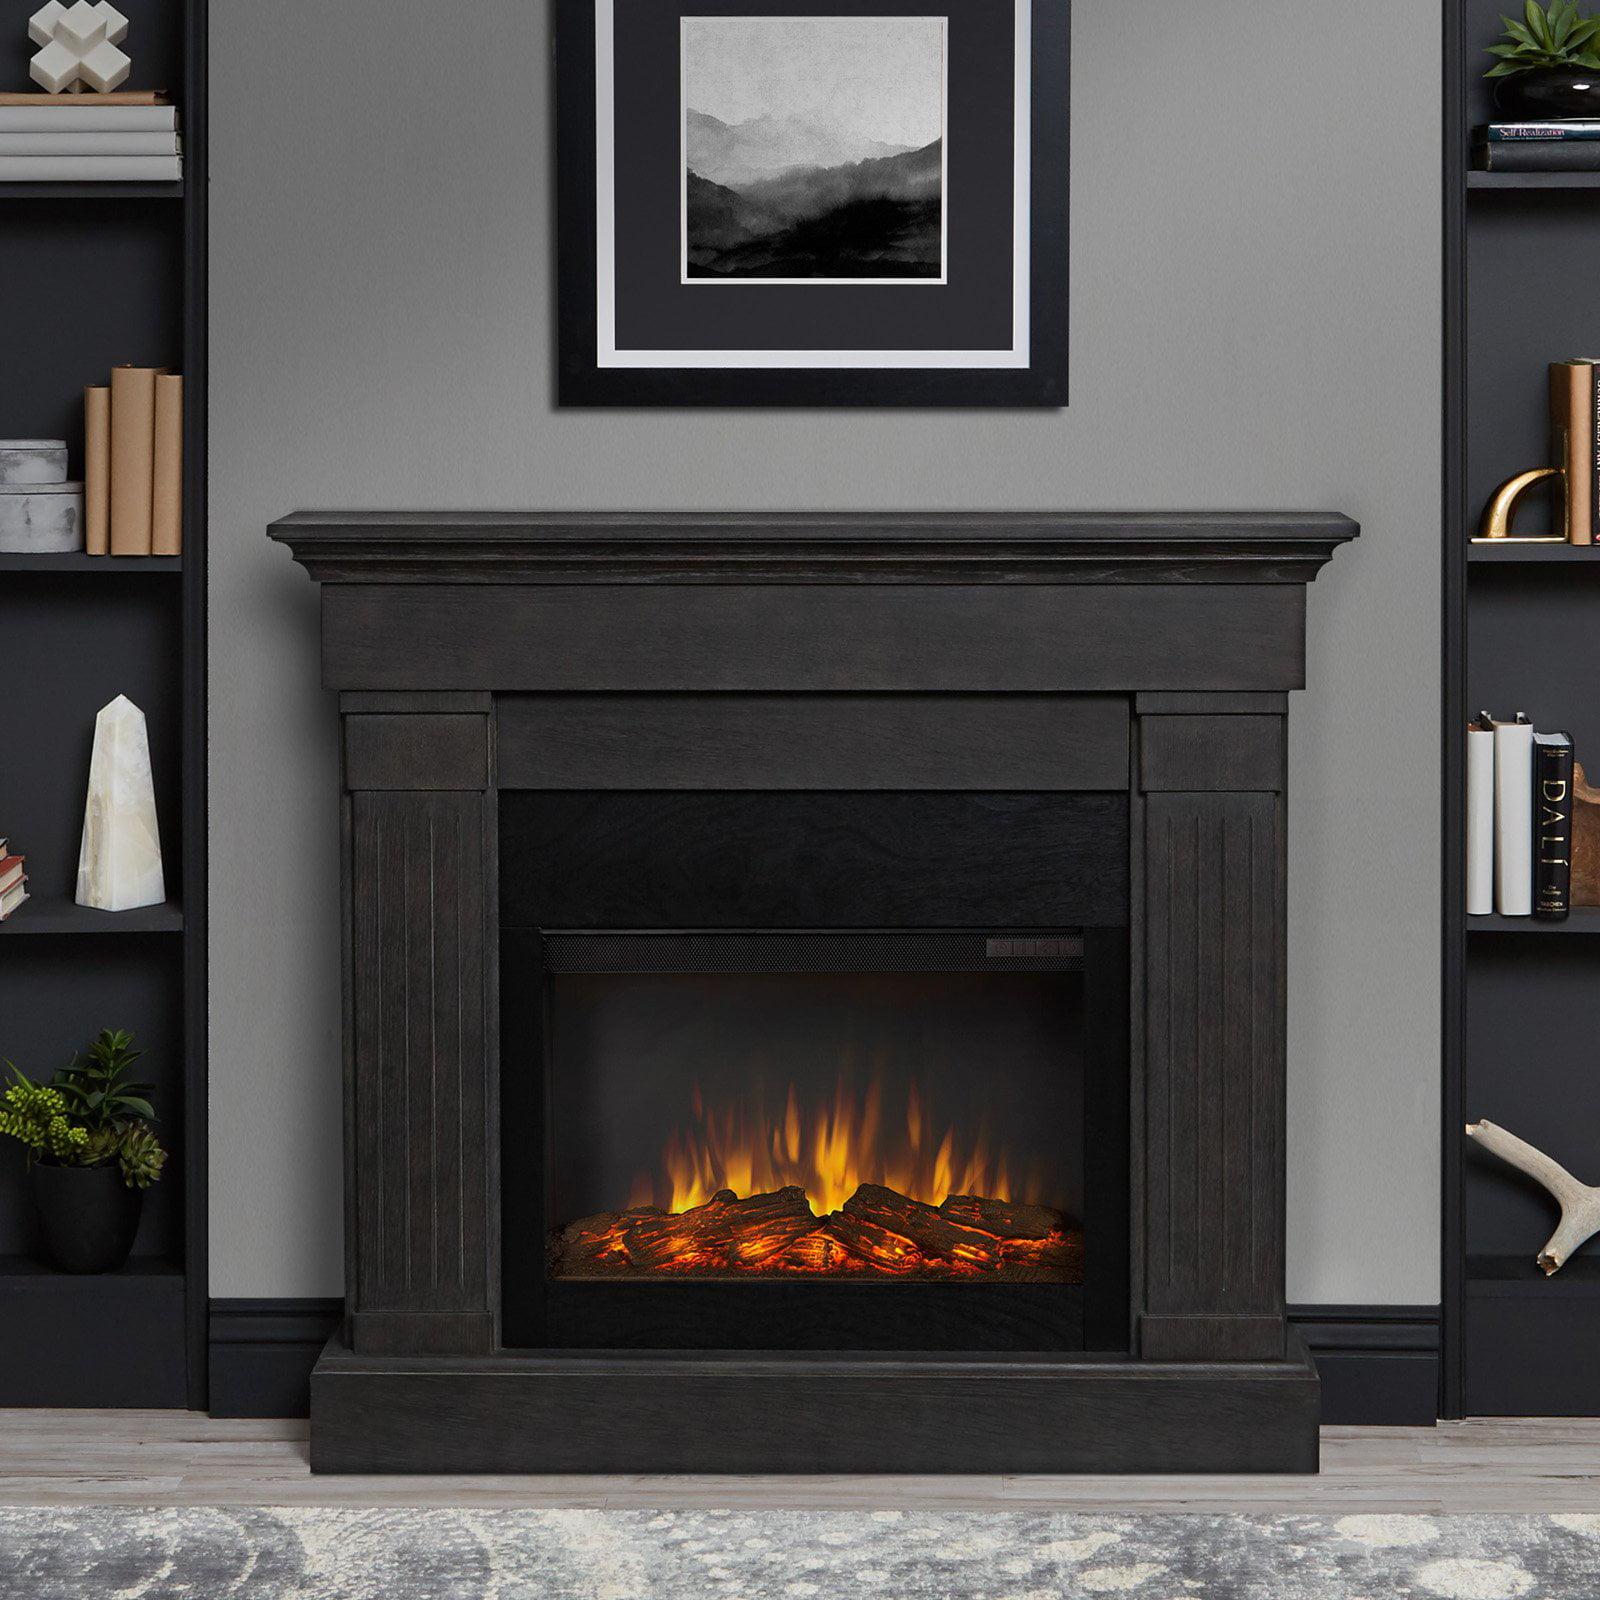 Real Flame Crawford Slim Line Electric Fireplace - Walmart.com